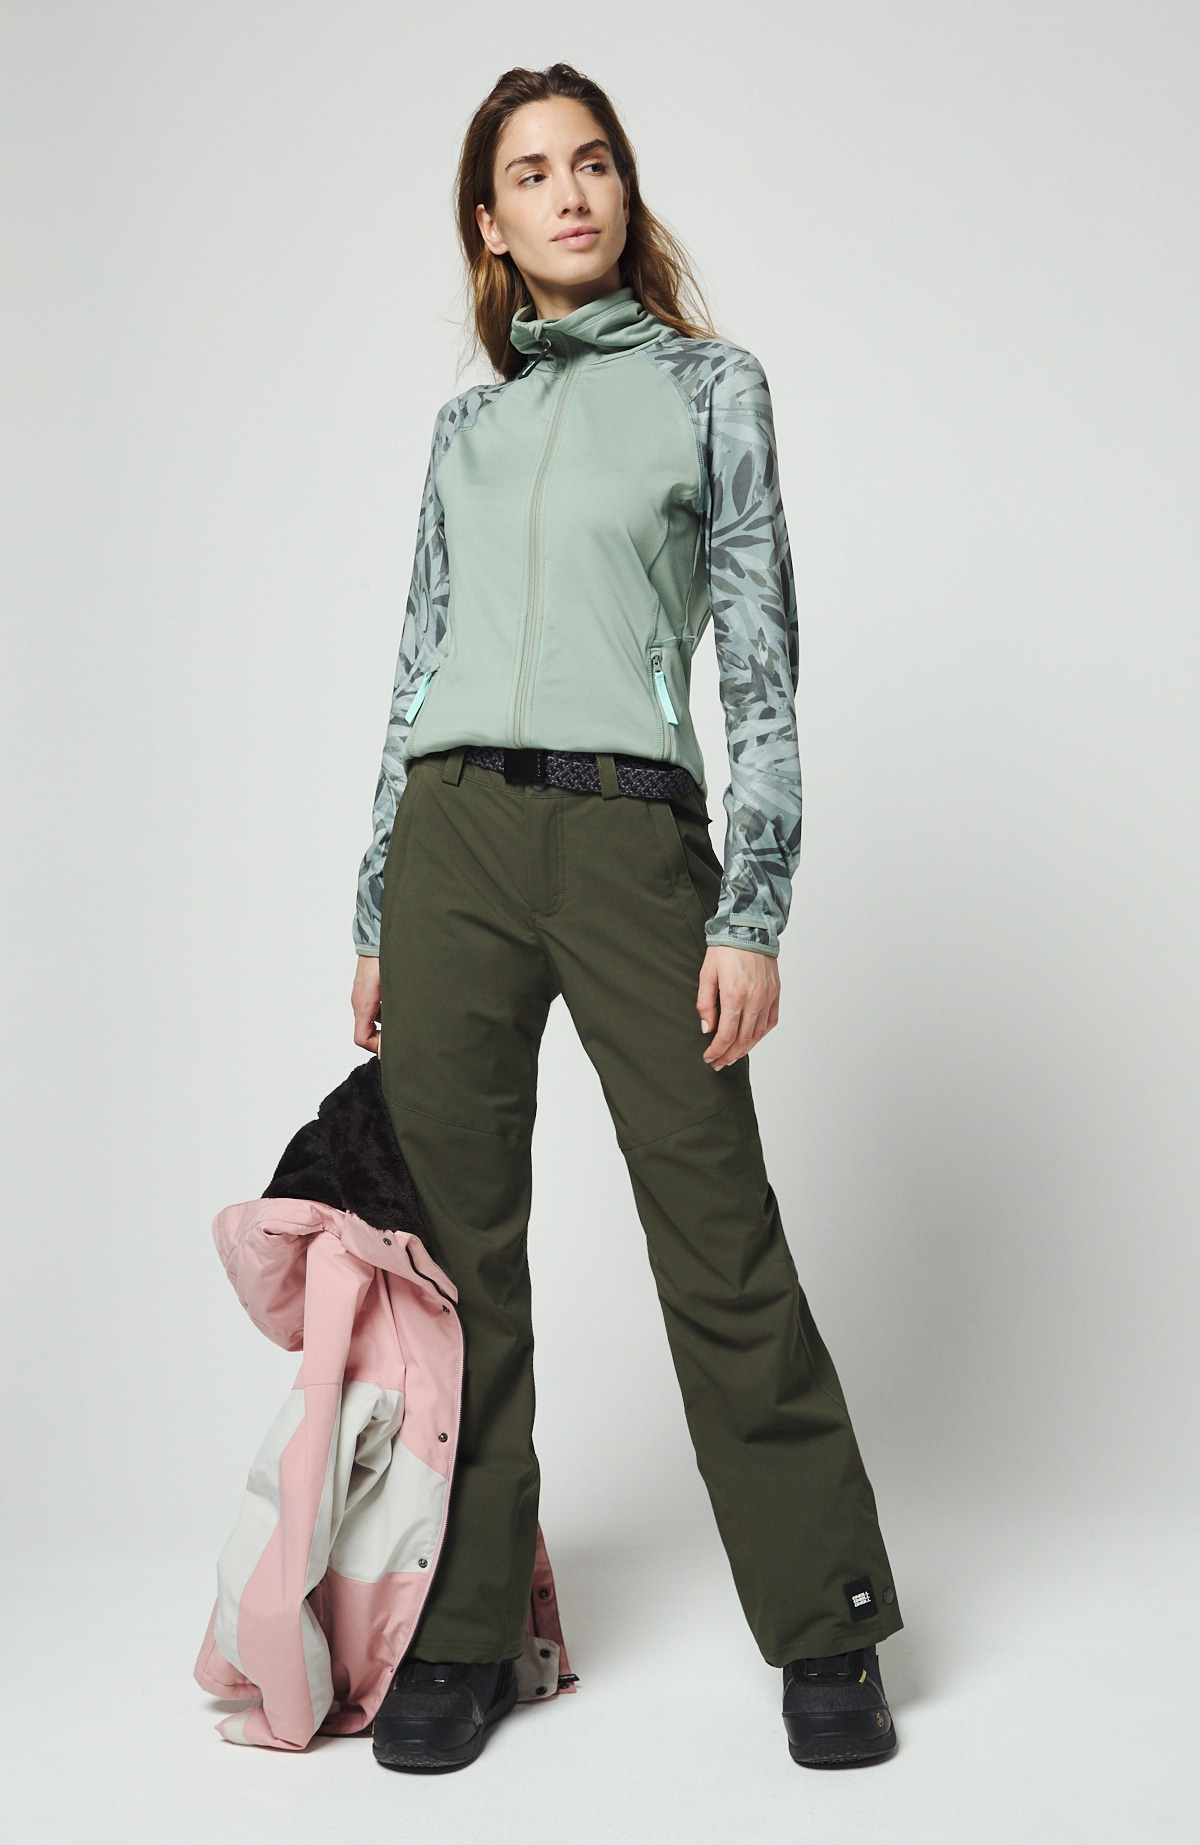 O'Neill Skihose grün Damen Wintersporthosen Sporthosen Sportmode Sporthose